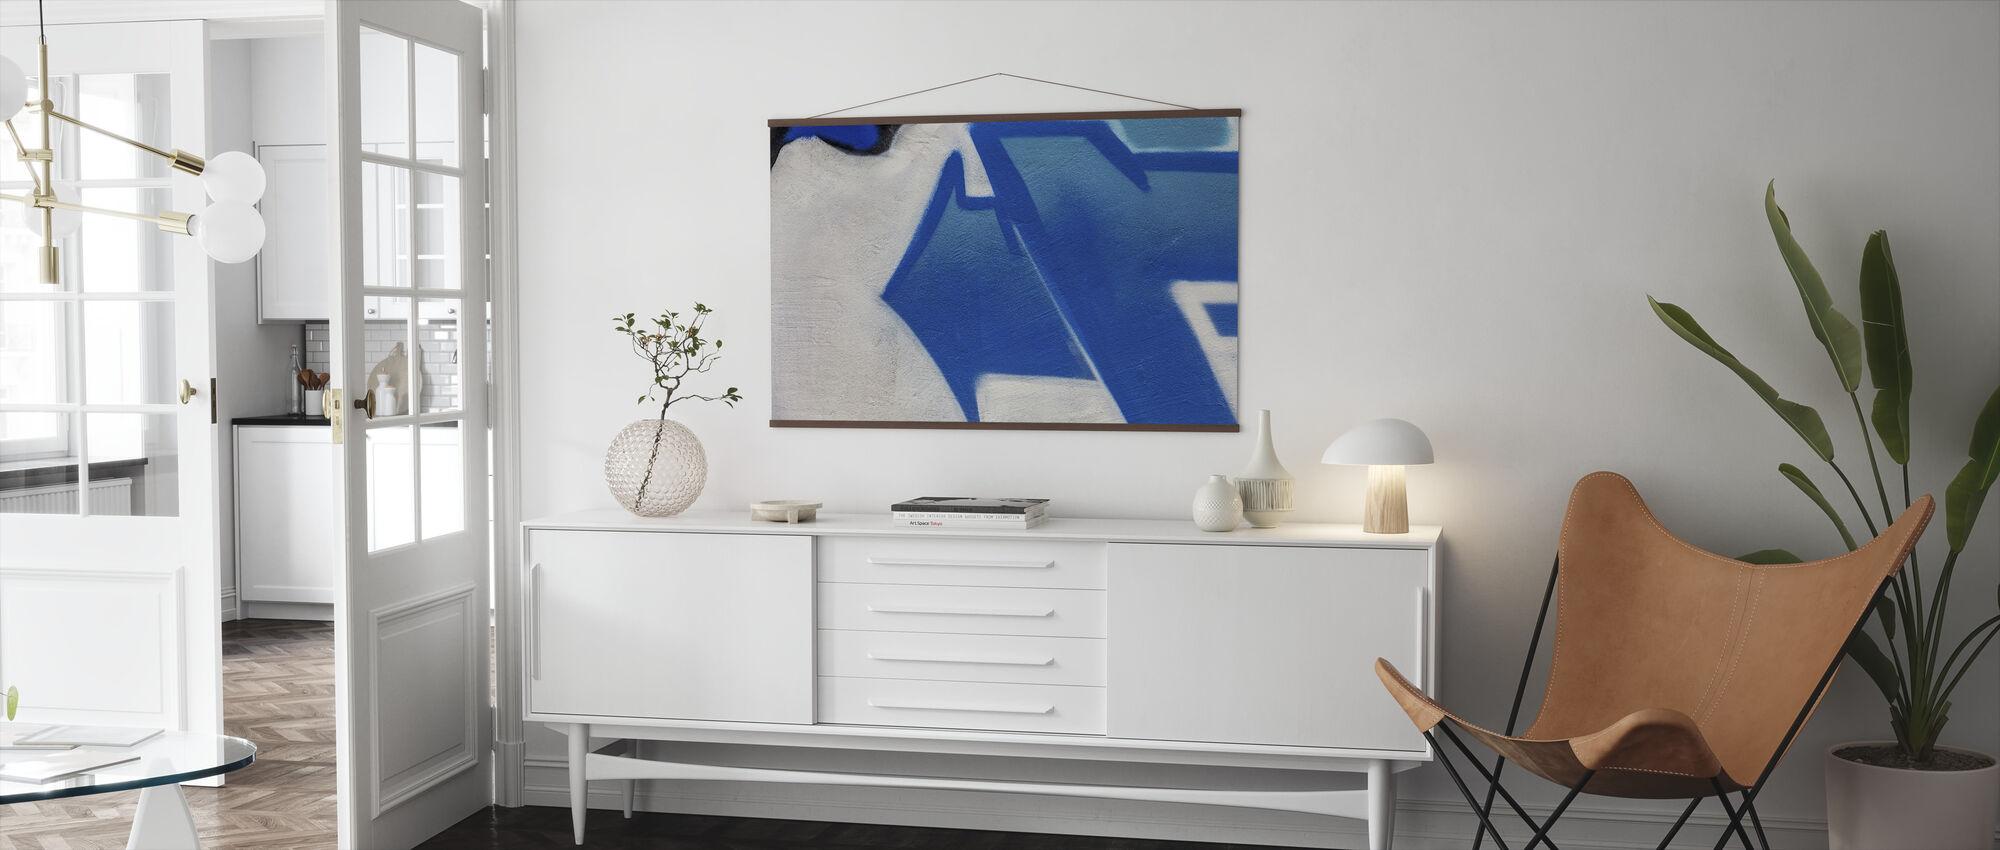 Blue Arrow Graffiti - Poster - Living Room